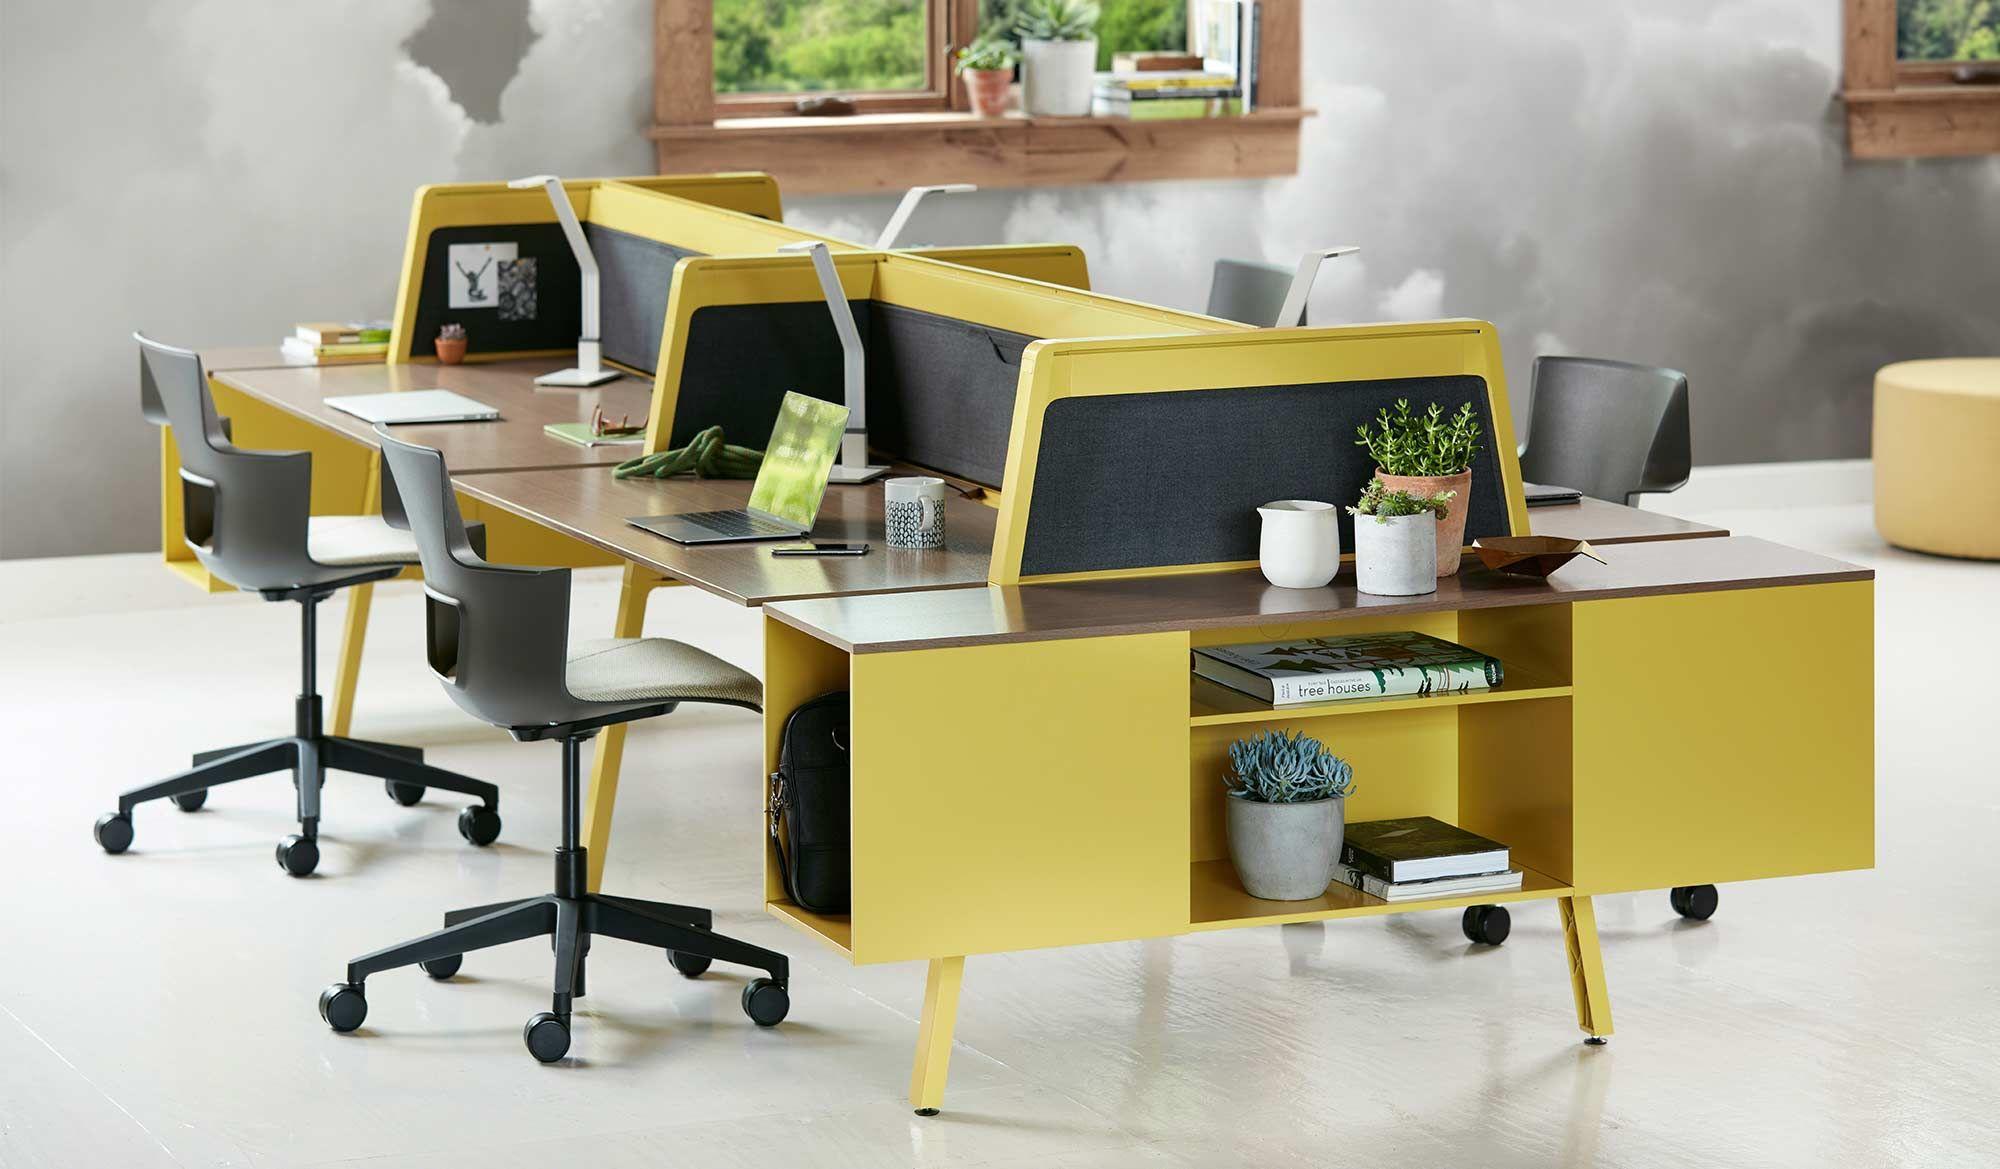 Bivi Collection Of Modular Office Desk Systems Turnstone Modern Office Furniture Design Office Furniture Modern Office Furniture Design